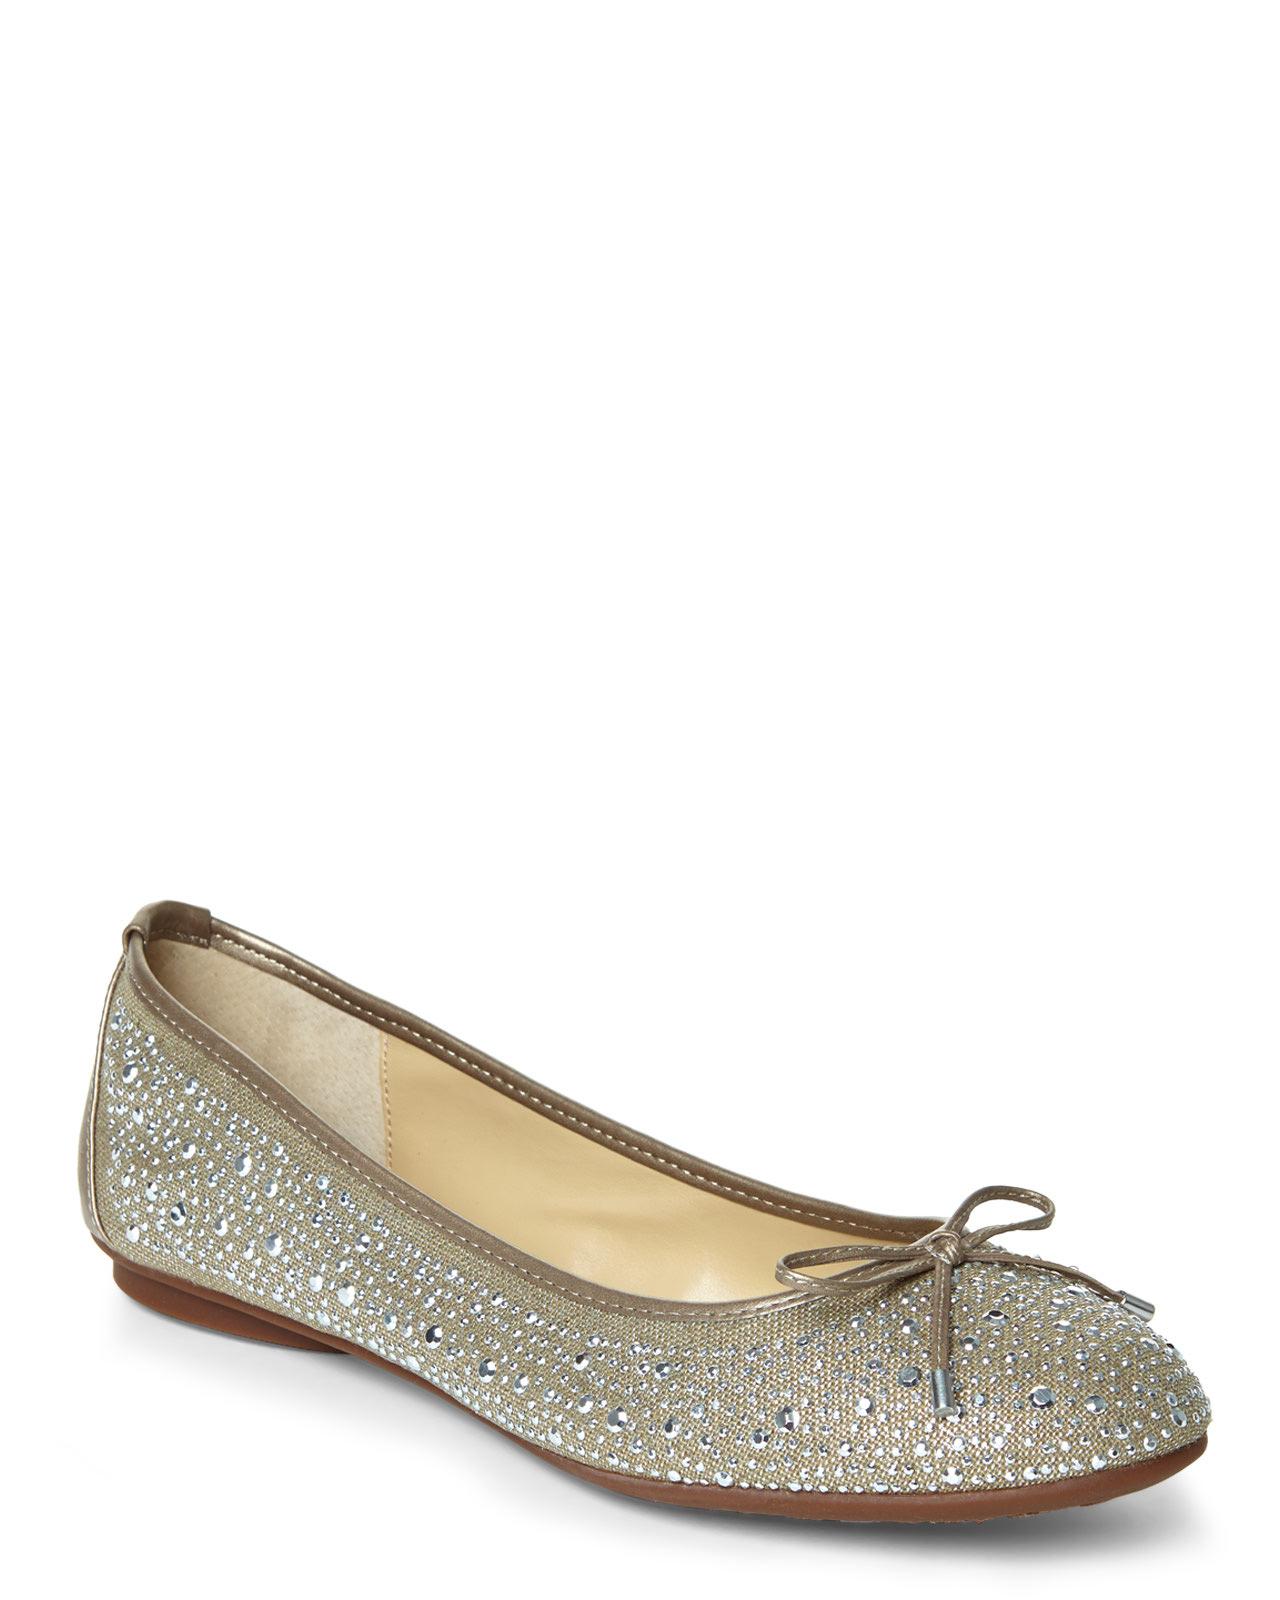 Adrienne Vittadini Shoes Flats